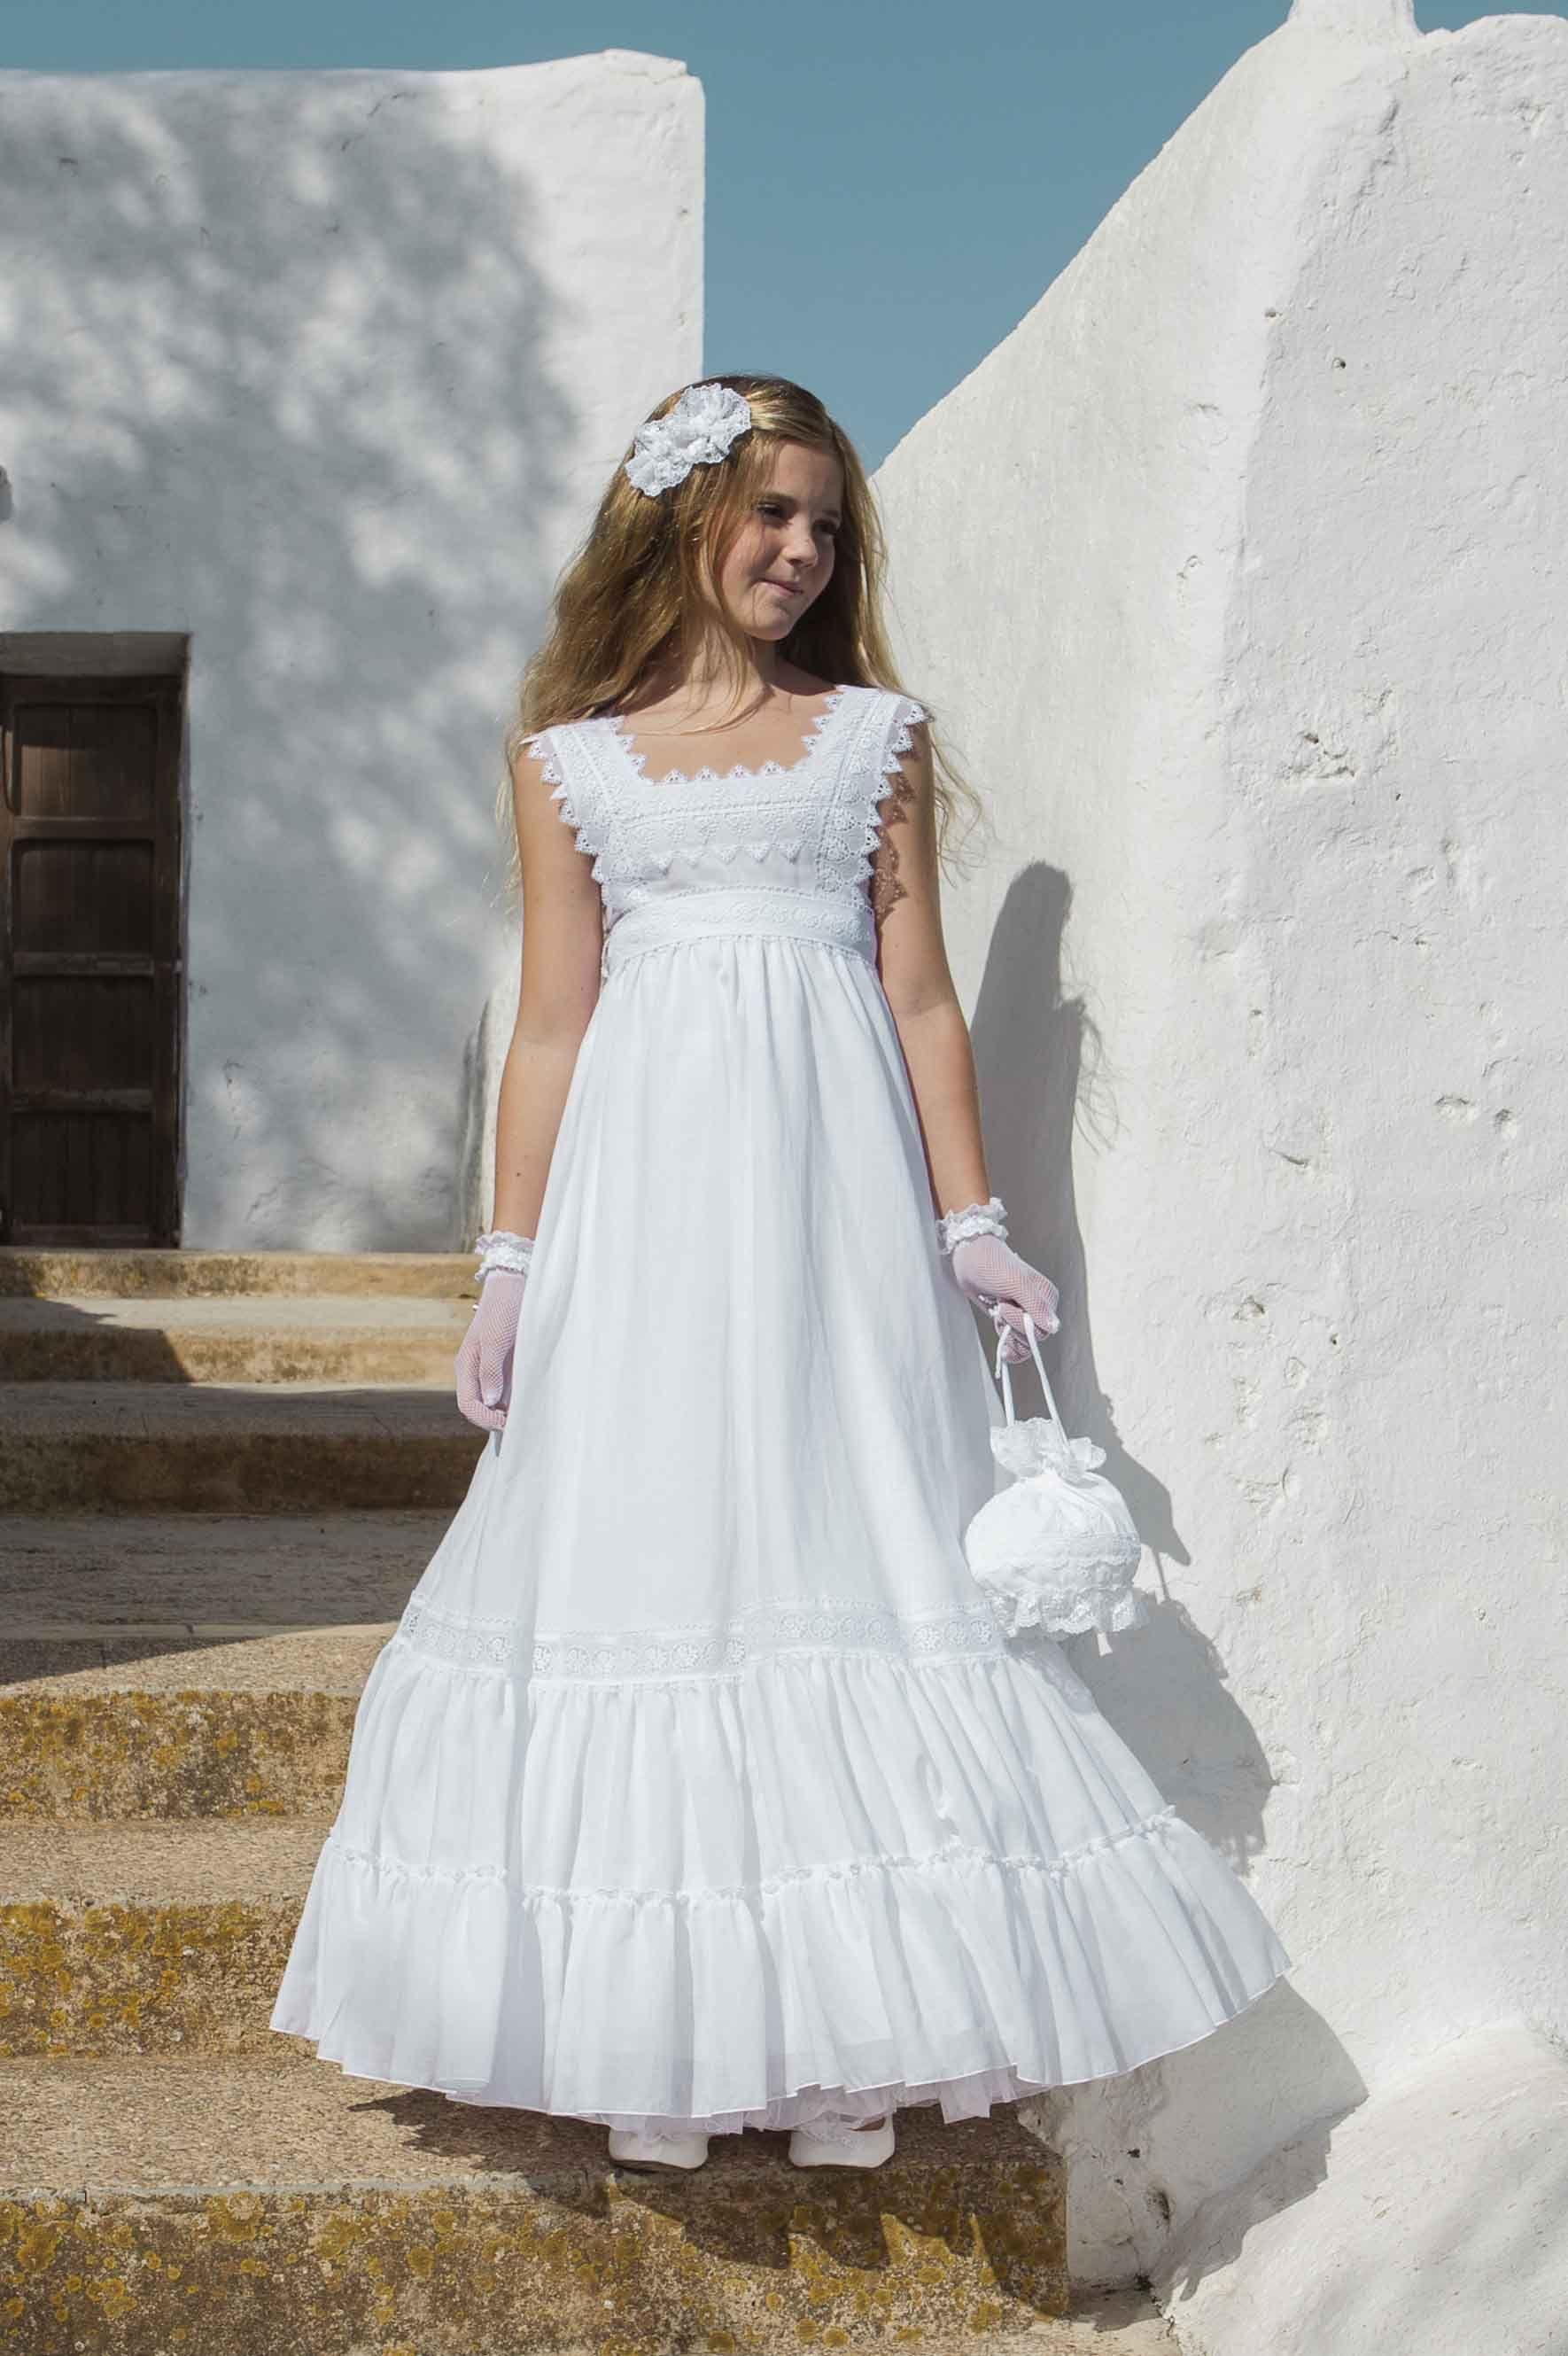 Vestido alicia charo ruiz ibiza moda adlib de ibiza y for Ibiza proms cd